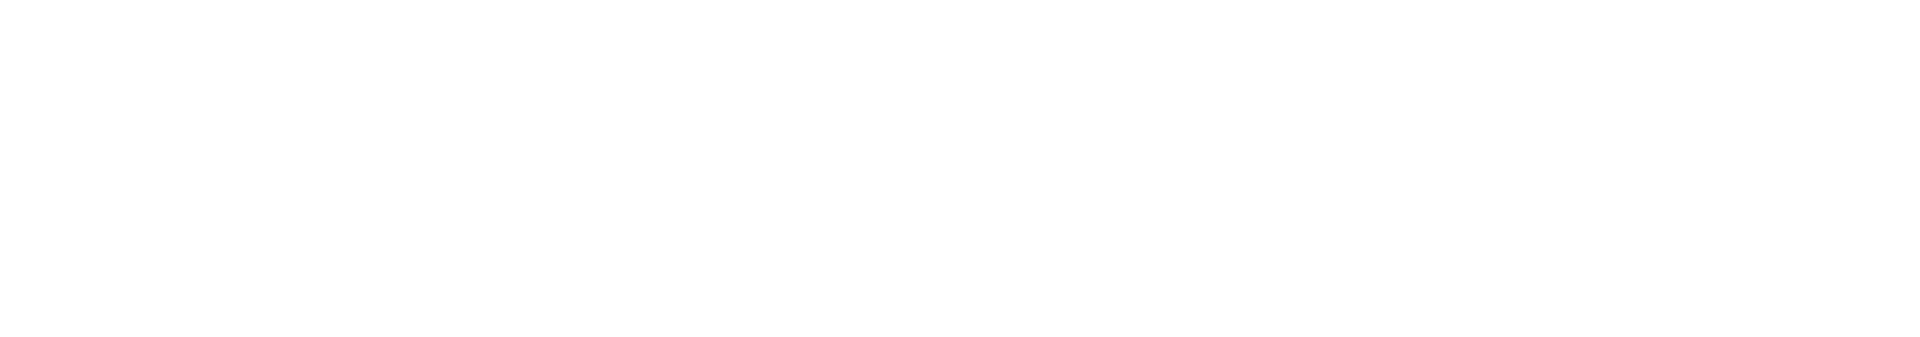 Protones Veranstaltungstechnik